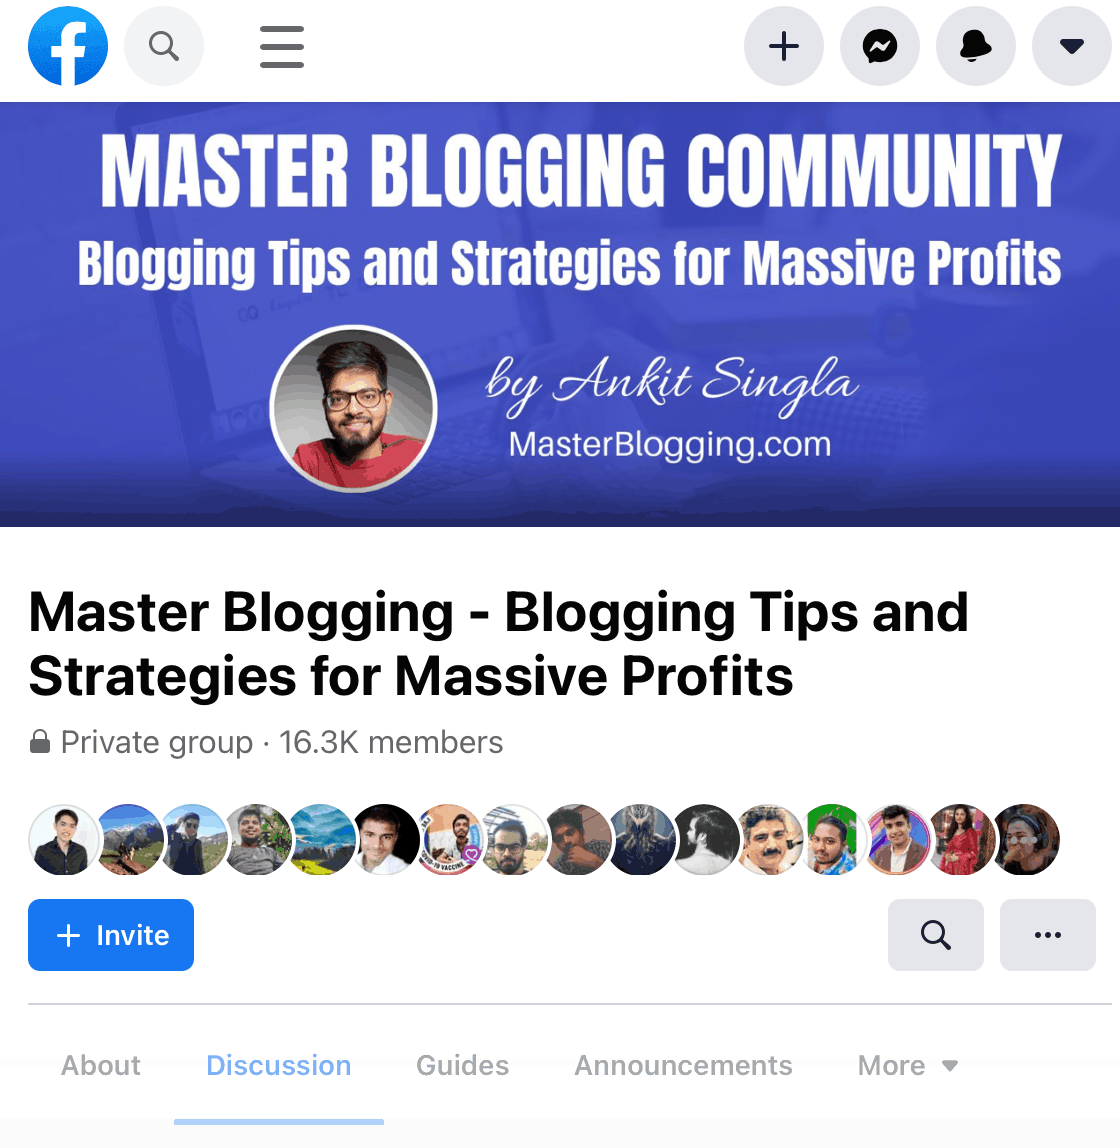 Master Blogging Community